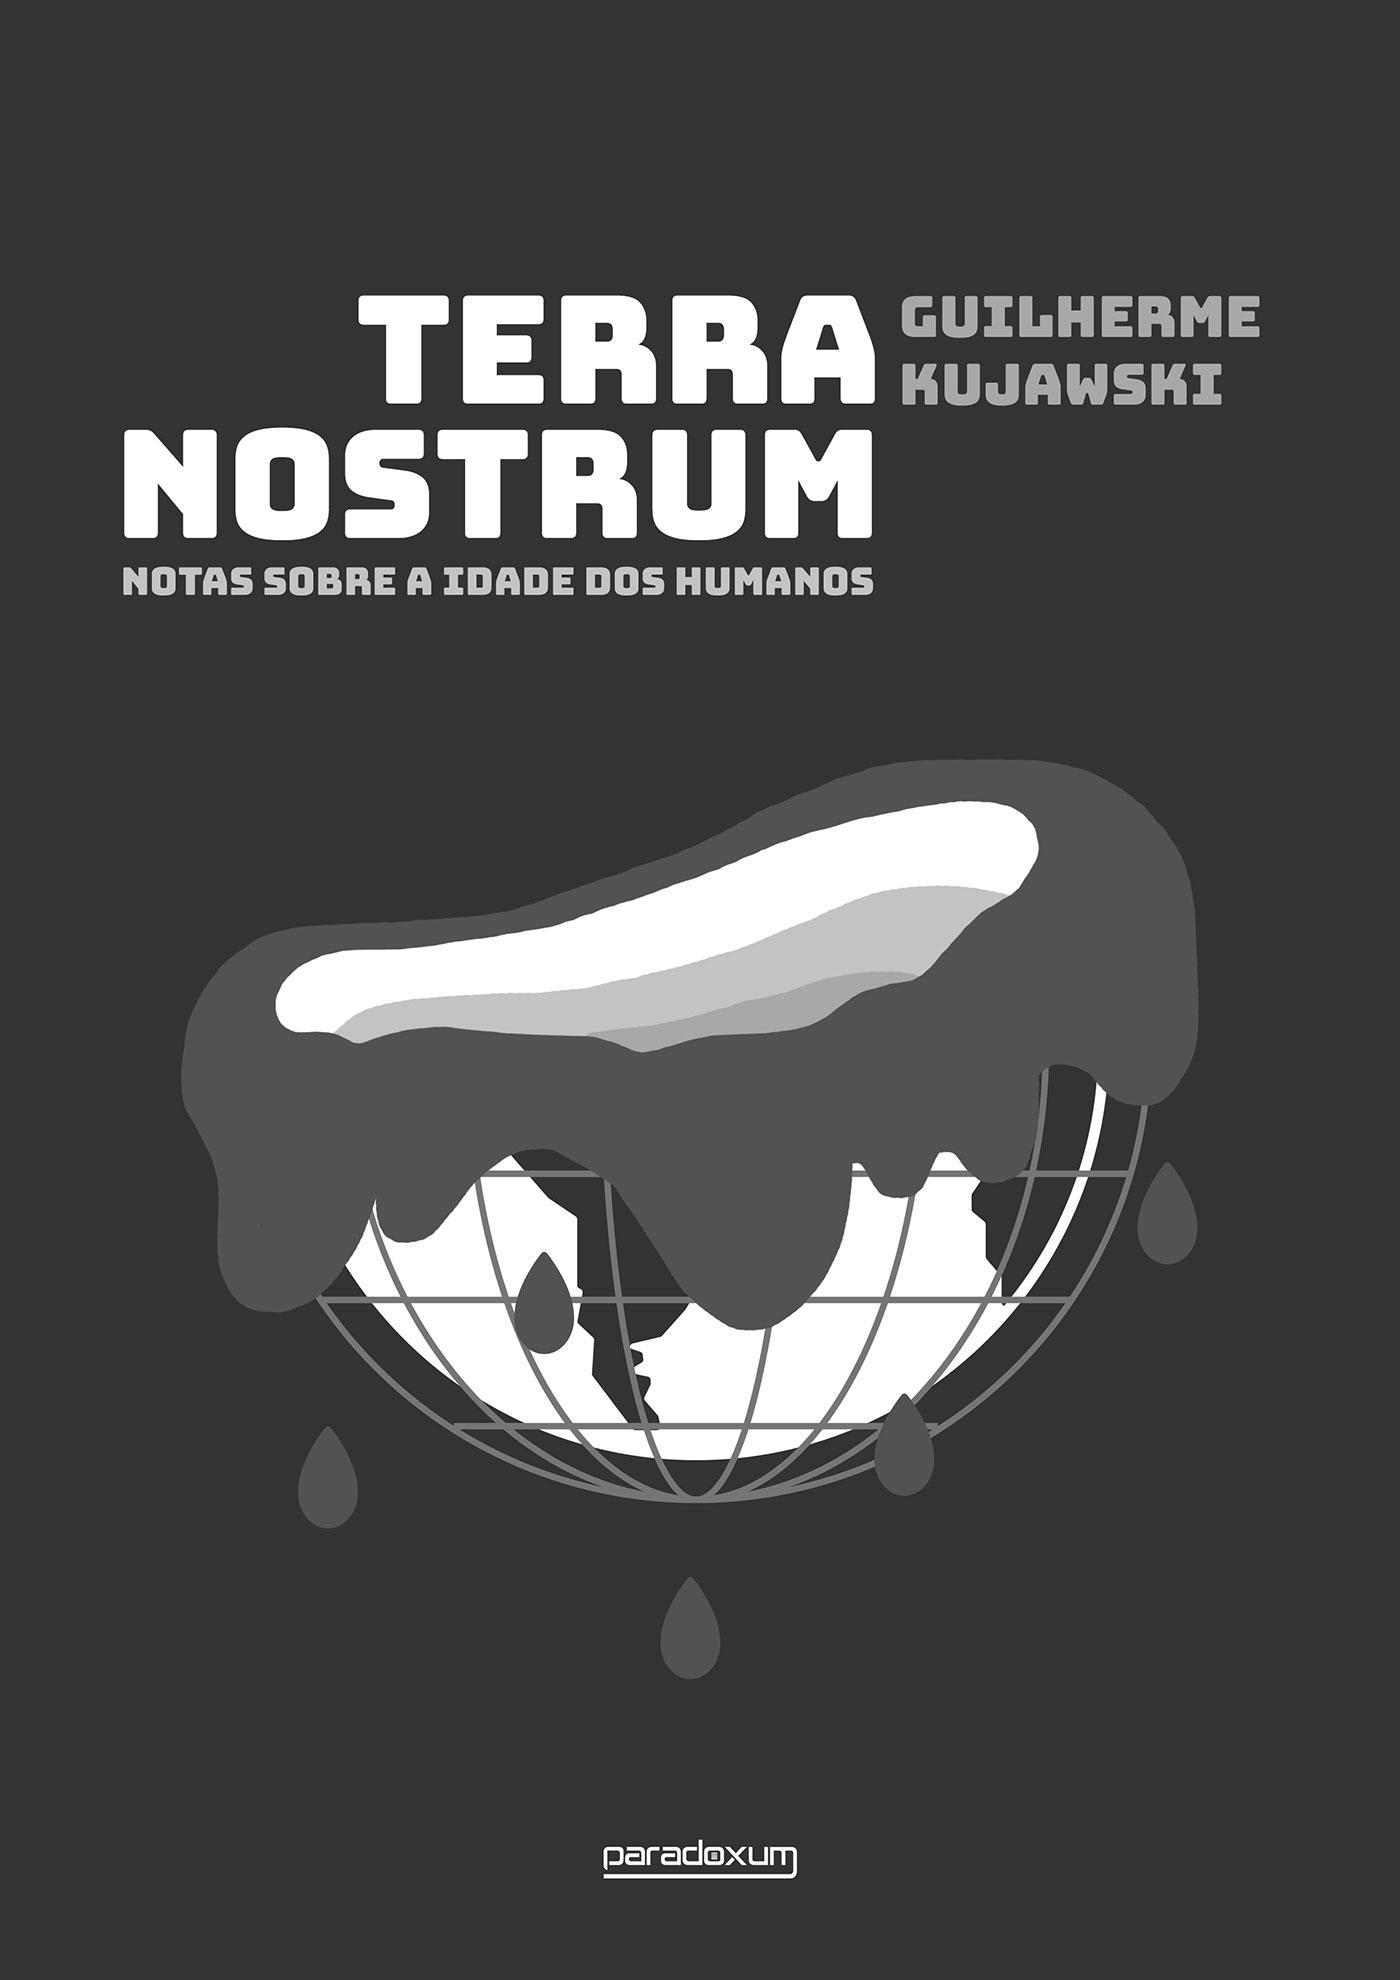 TERRA NOSTRUM